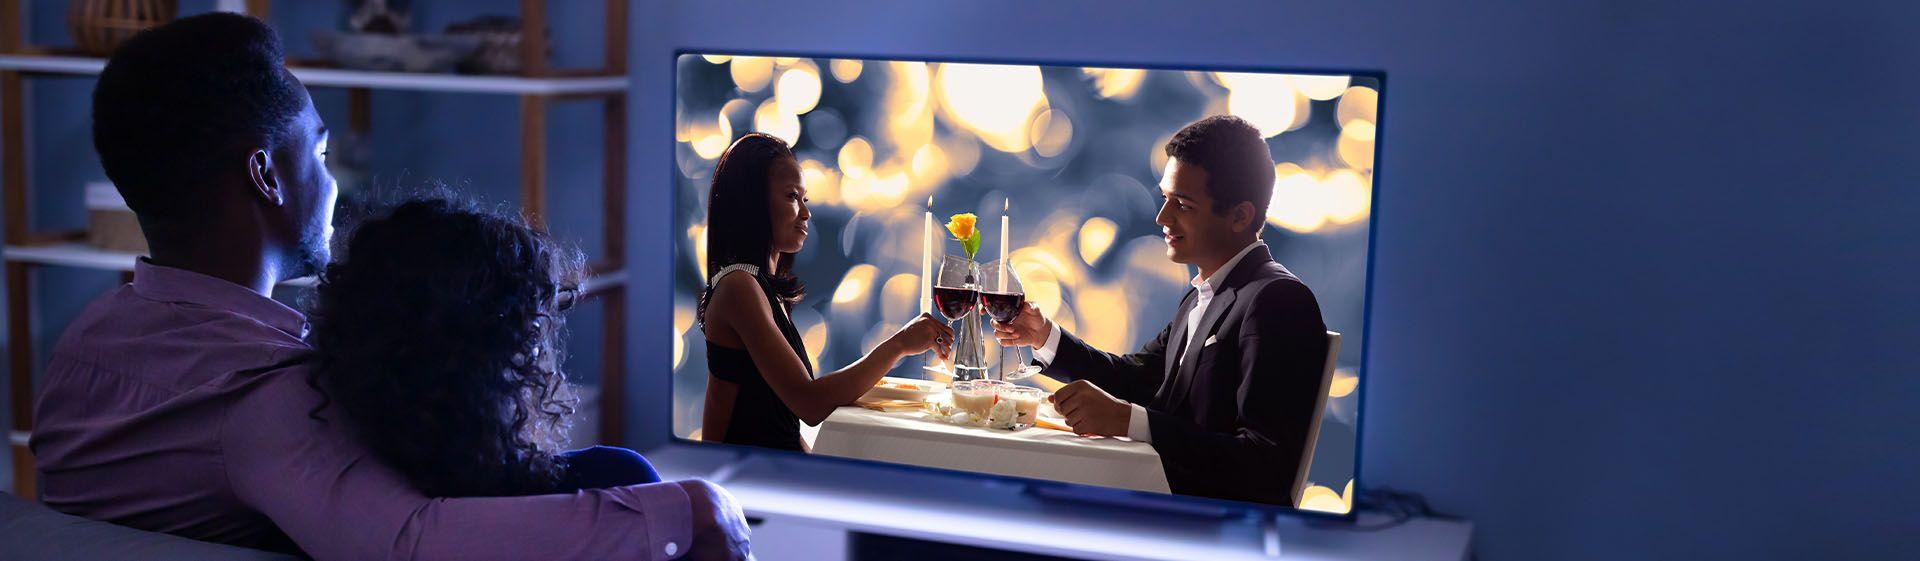 Smart TVs 2020: confira melhores modelos HD, Full HD, 4K e 8K